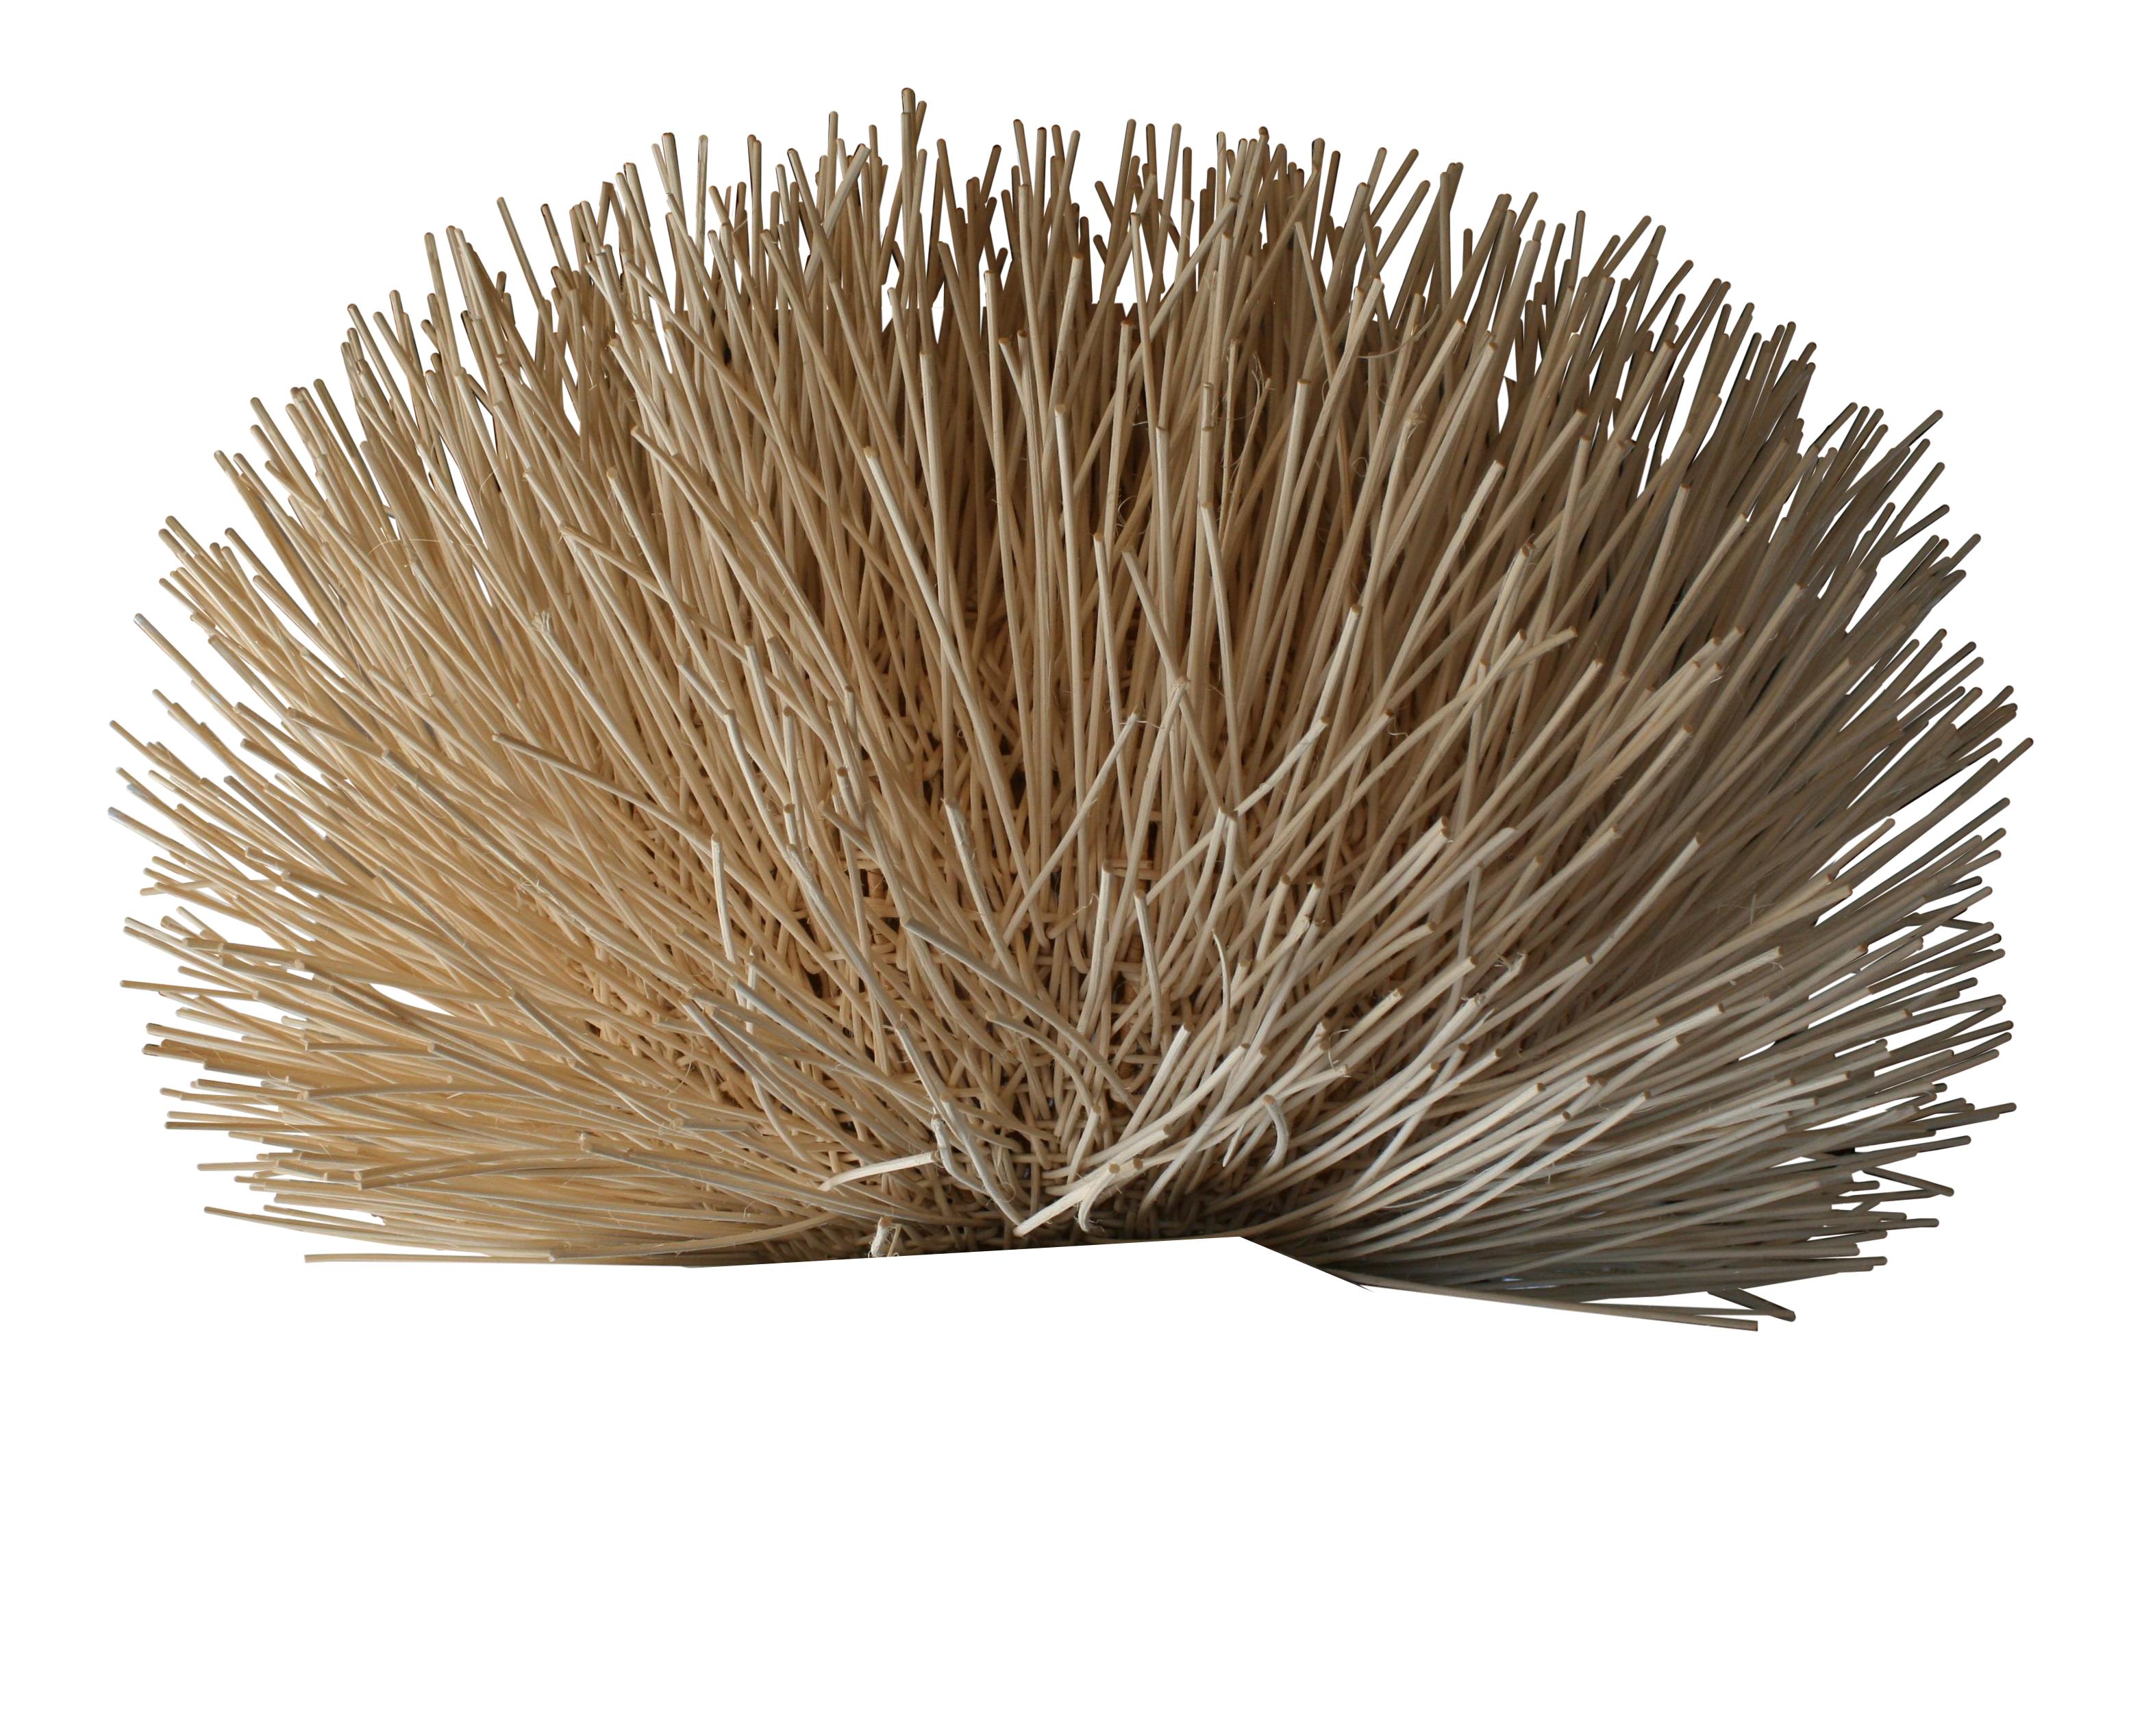 urchin libraries starburst chandeliers og gem organic contemporary chandelier transitional